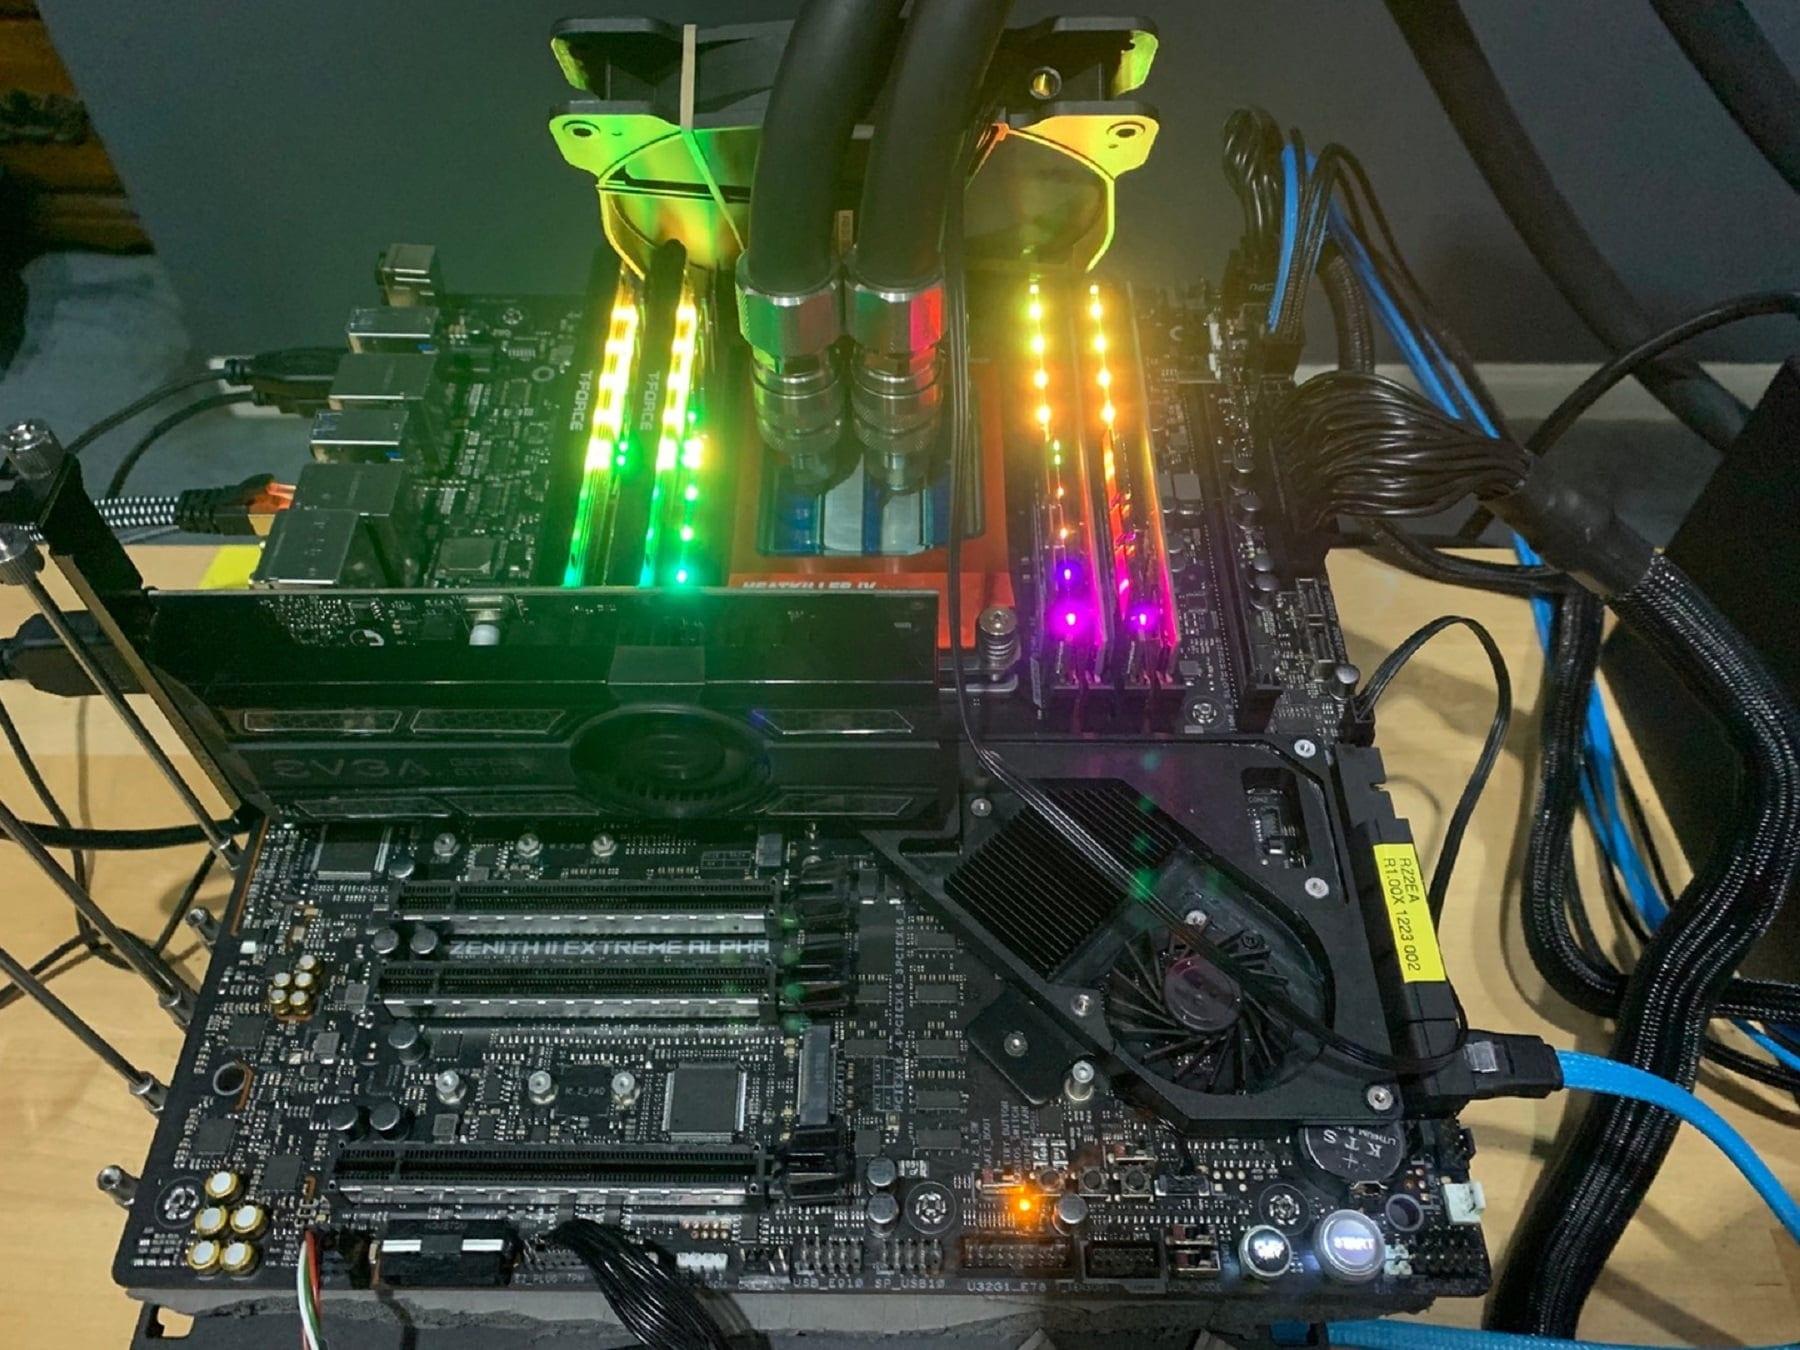 keeph8n установил два рекорда в 24-ядерном зачете с помощью чипа AMD Ryzen Threadripper 3960X